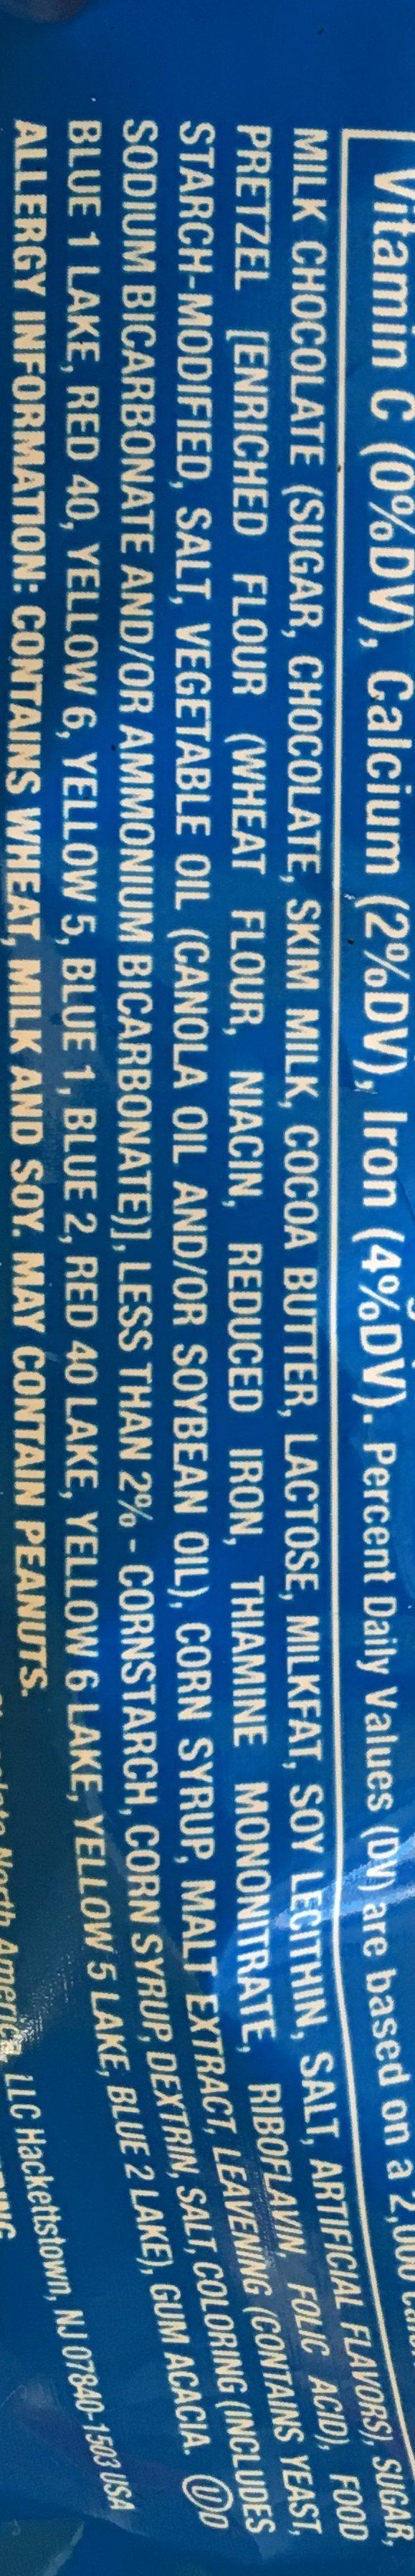 M &M'S Pretzel Sharing Size - Ingredients - en